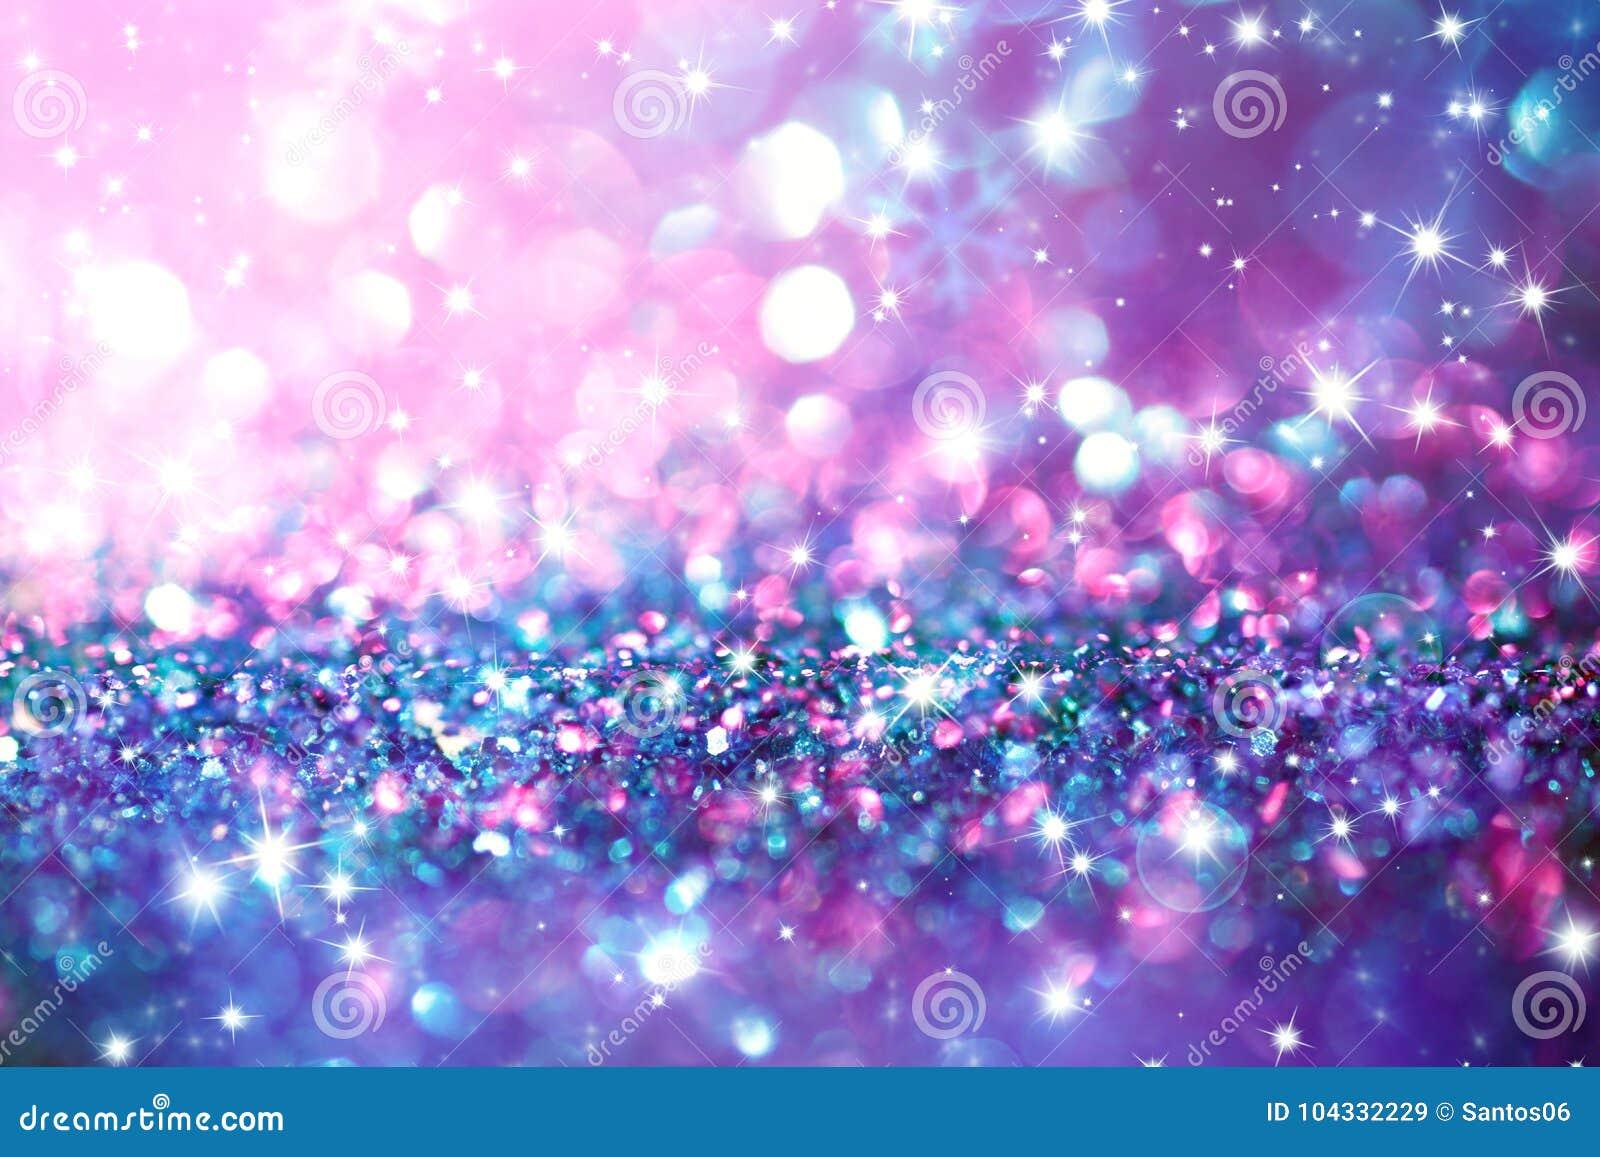 Download 76 Koleksi Background Glitter Terbaik